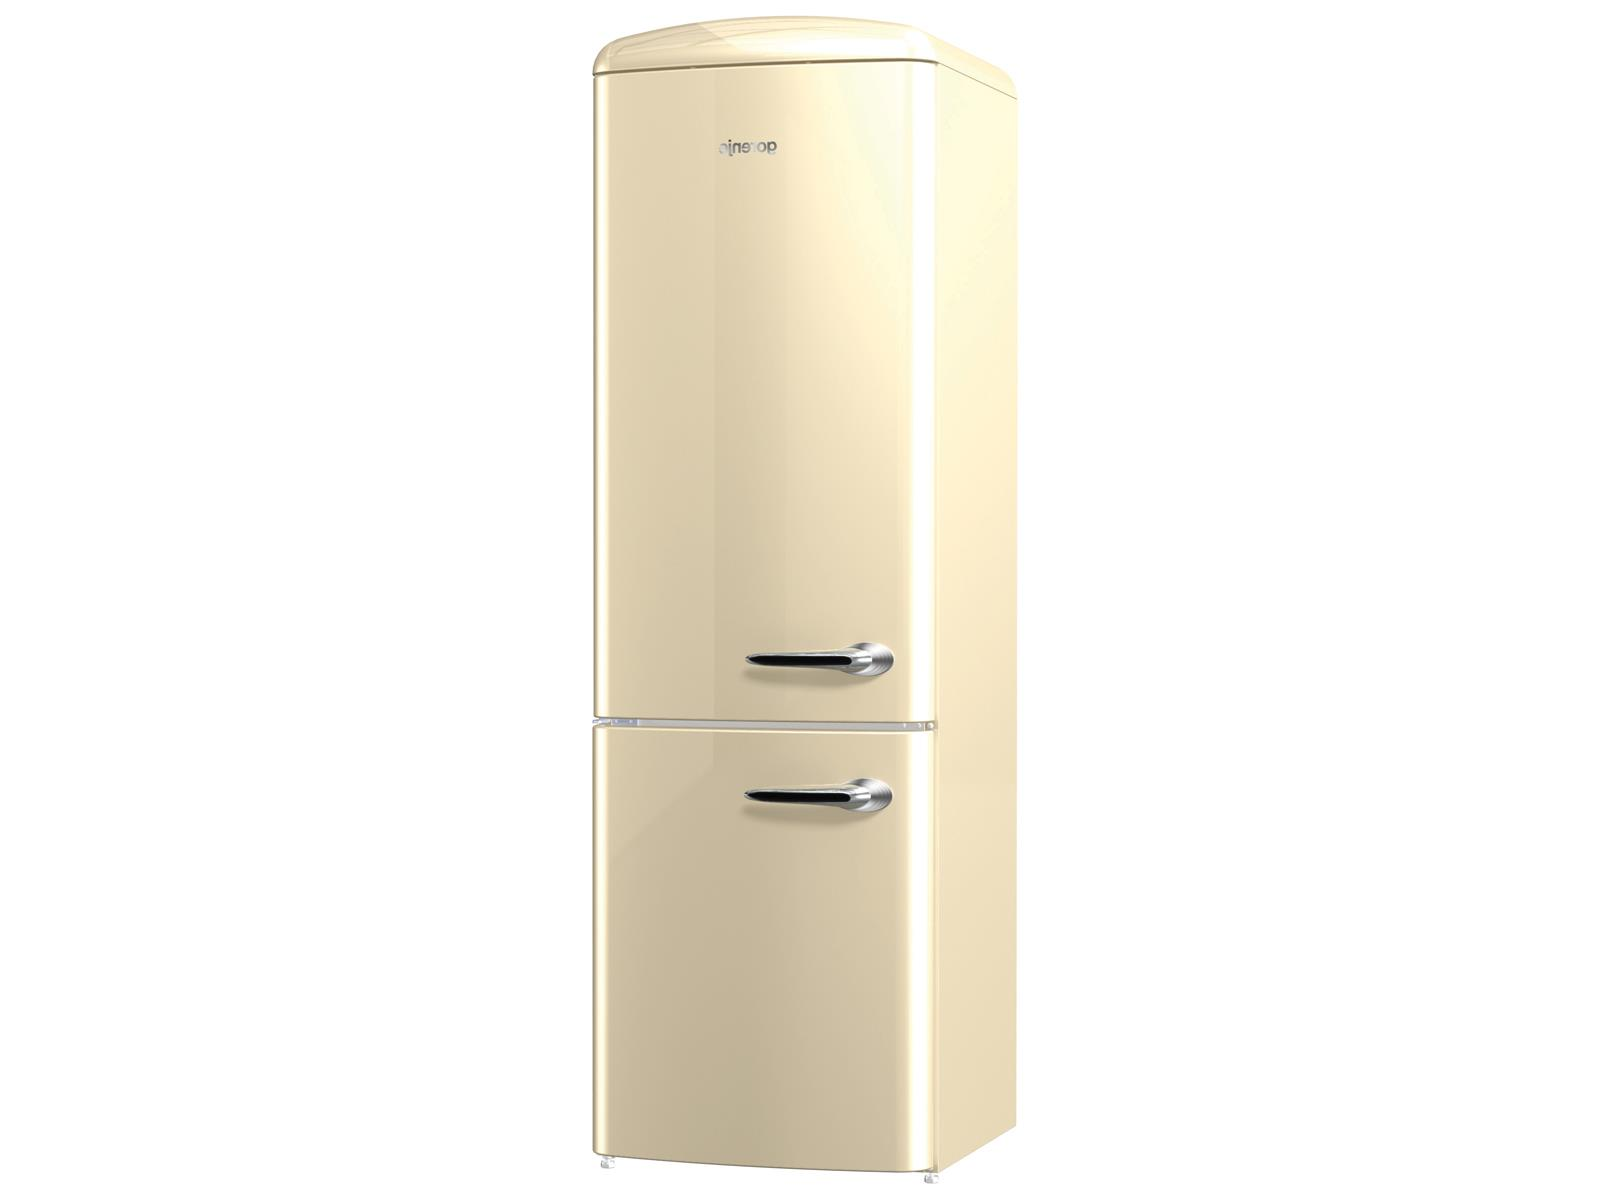 Kühlschrank Kombi : Kuehlschrank kombi guenstig severin kühl gefrierkombination ks